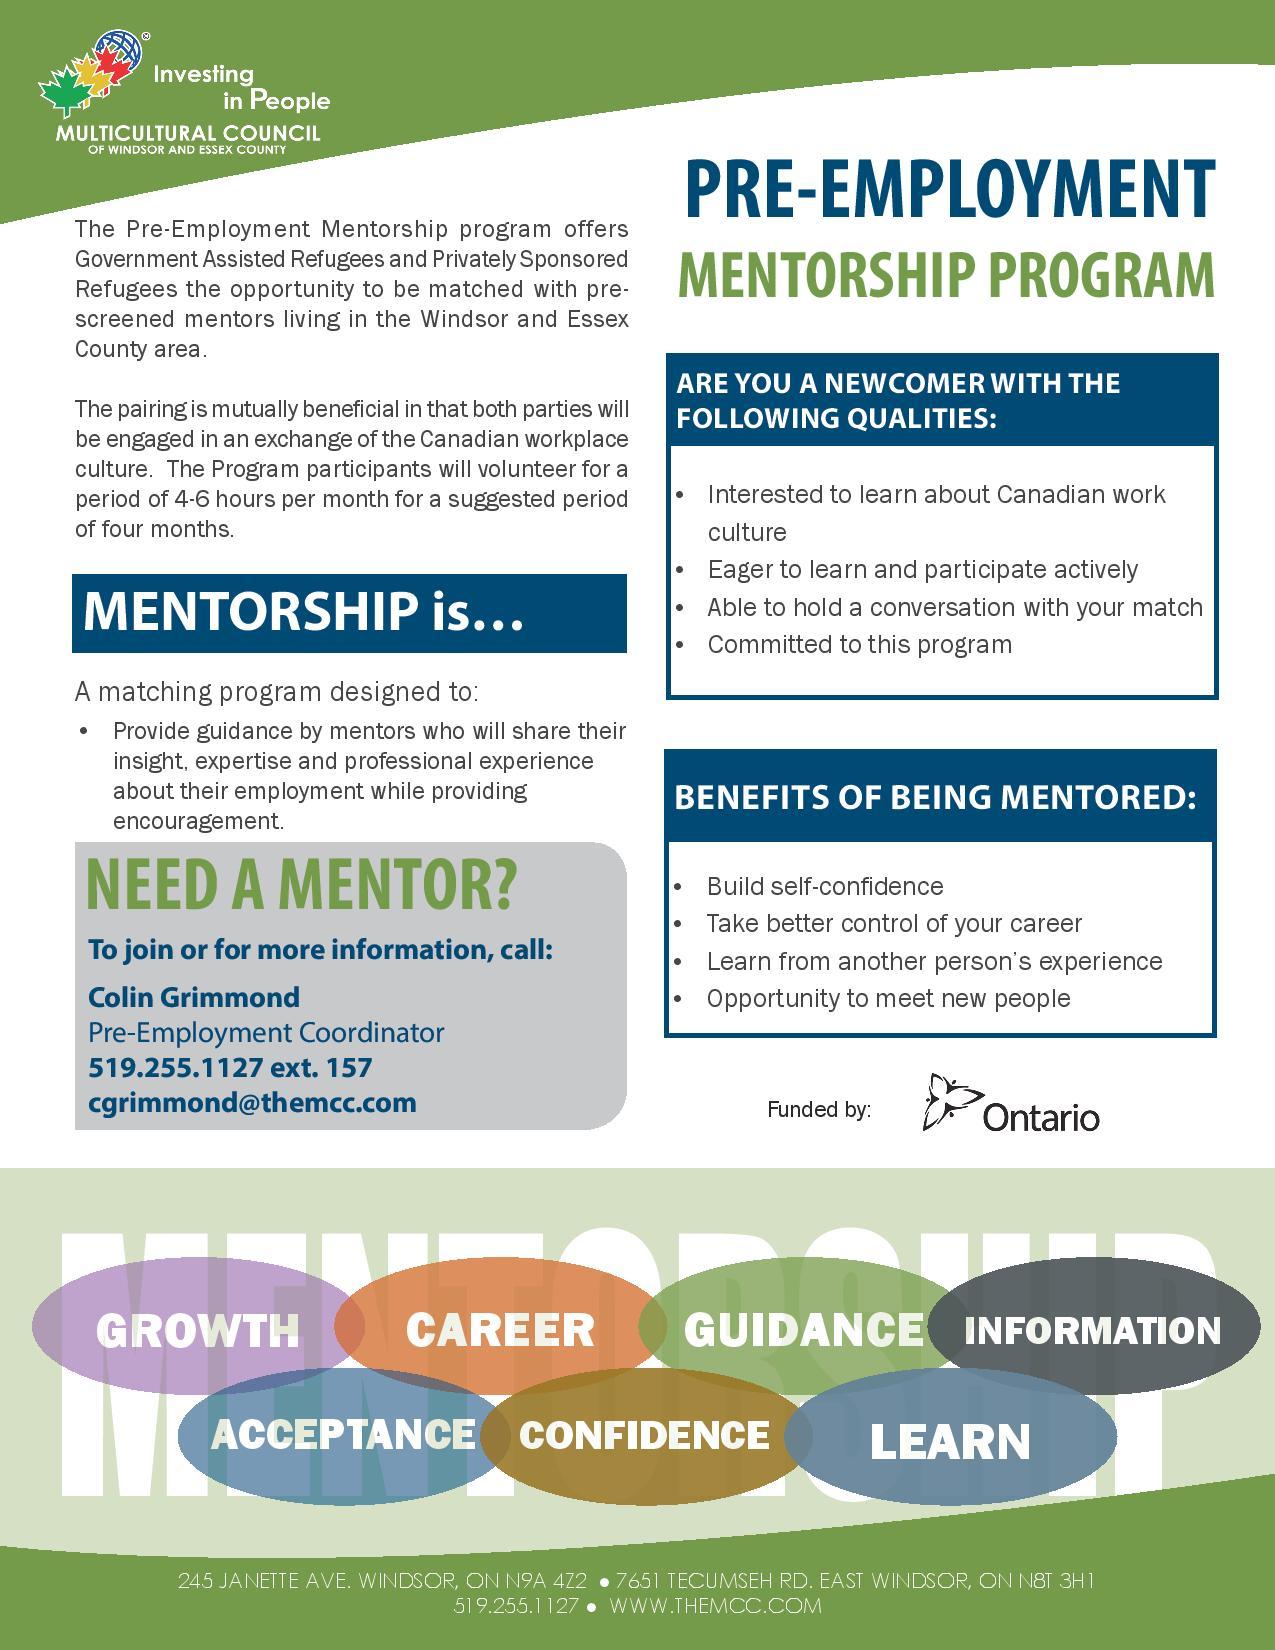 Need a mentor